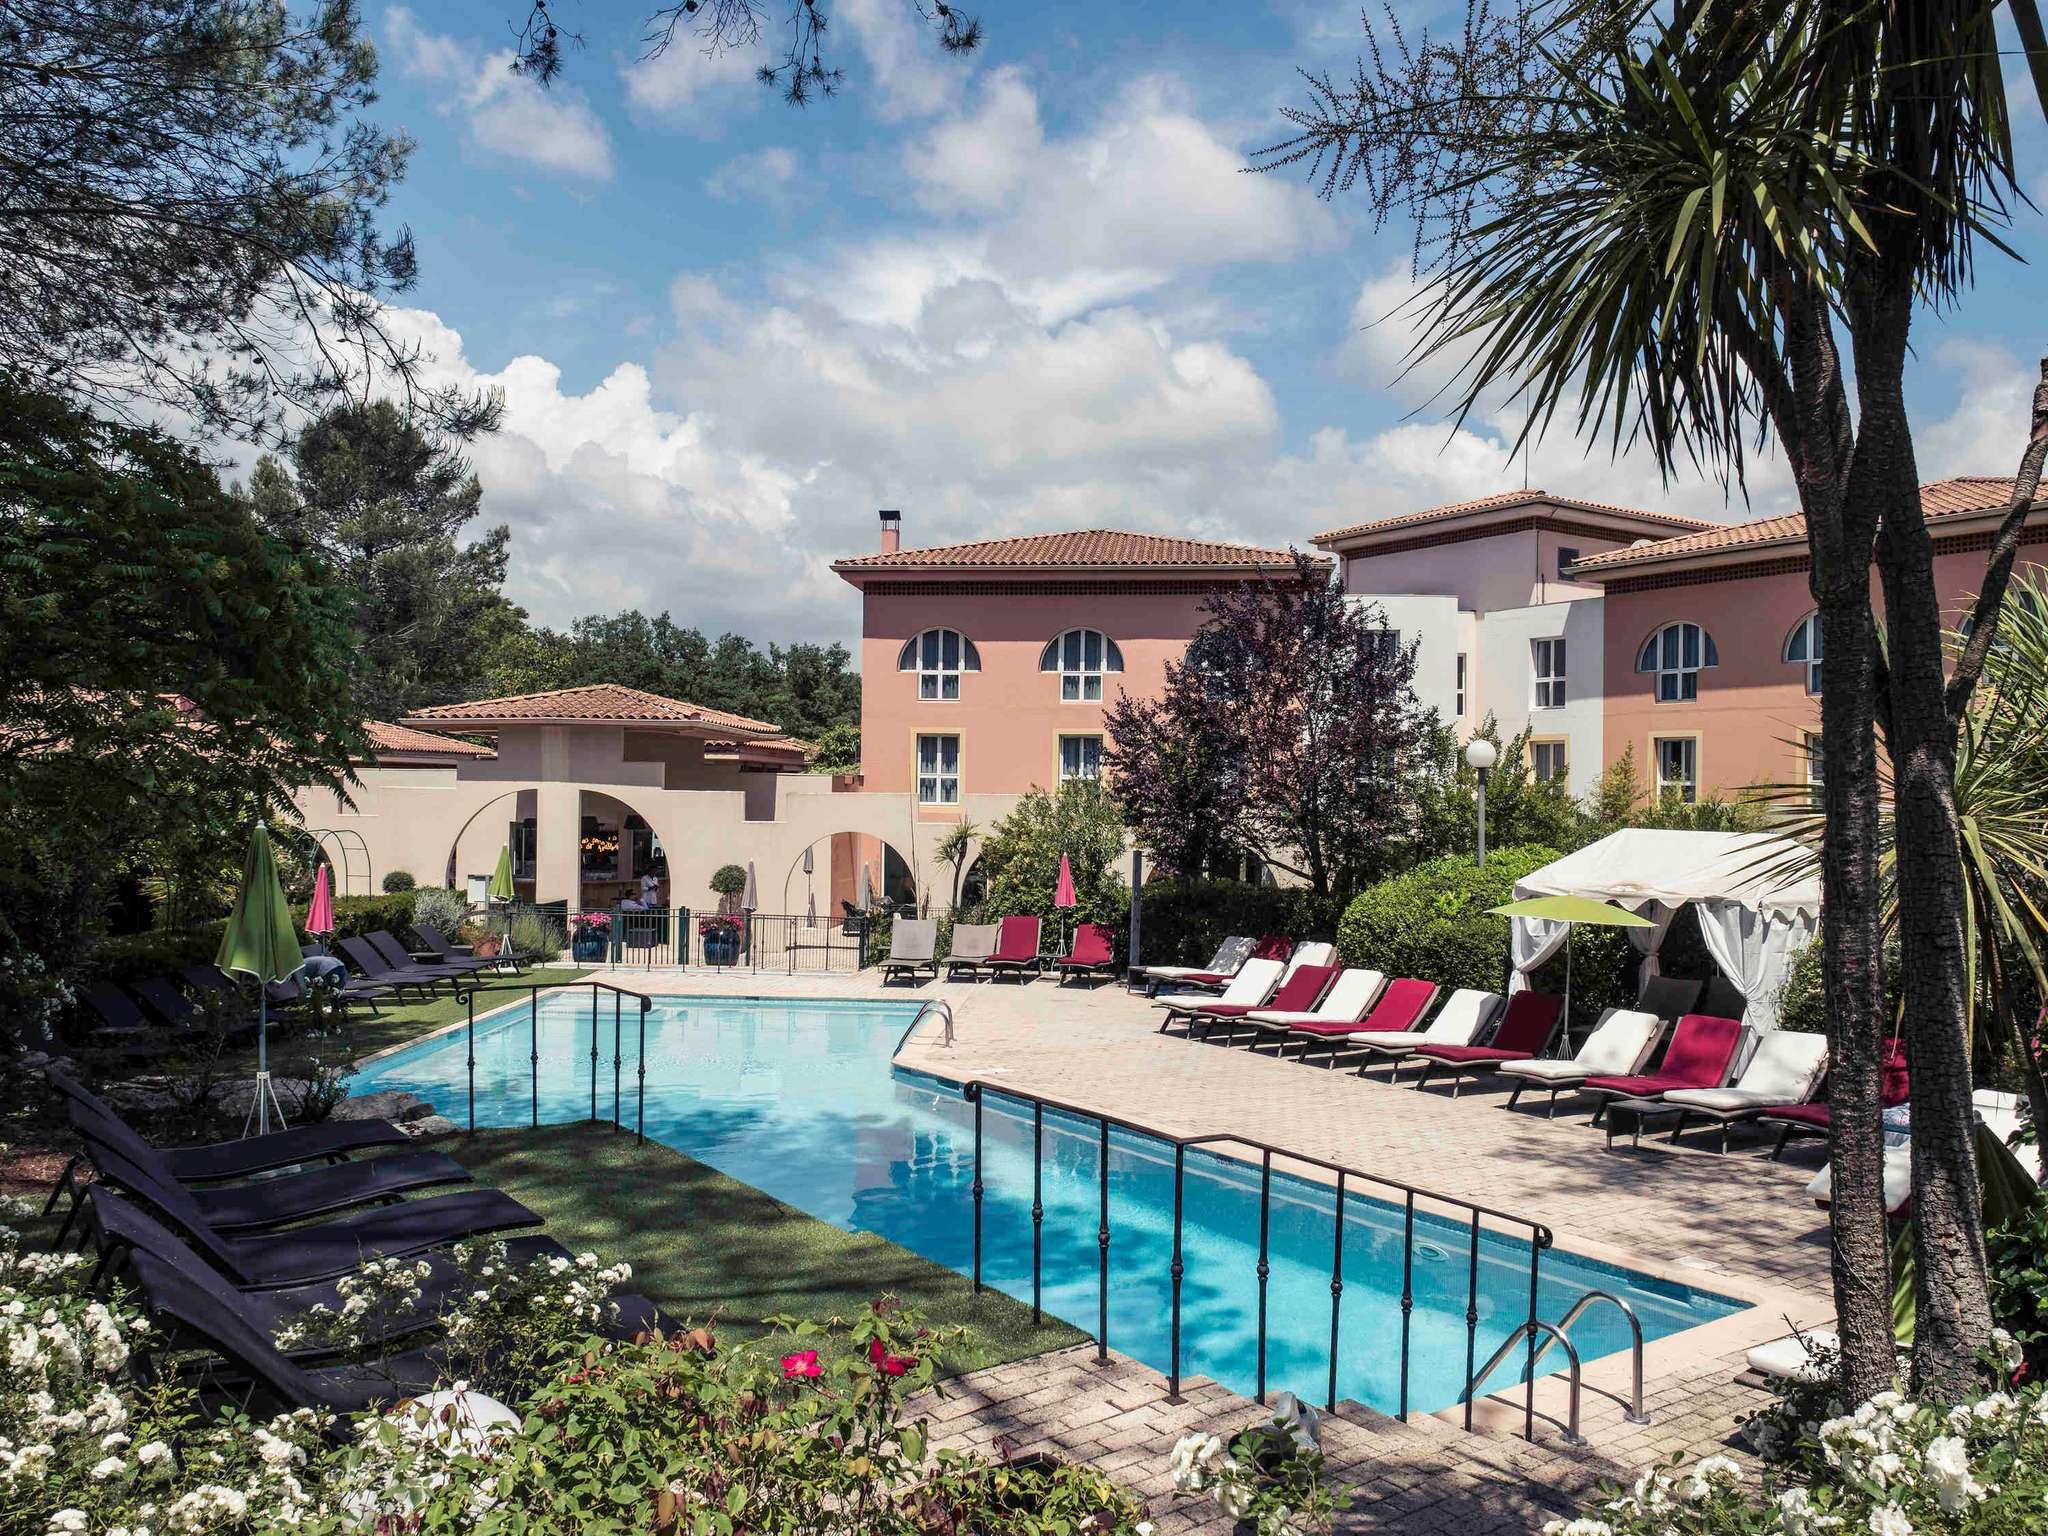 فندق - Hôtel Mercure Antibes Sophia Antipolis